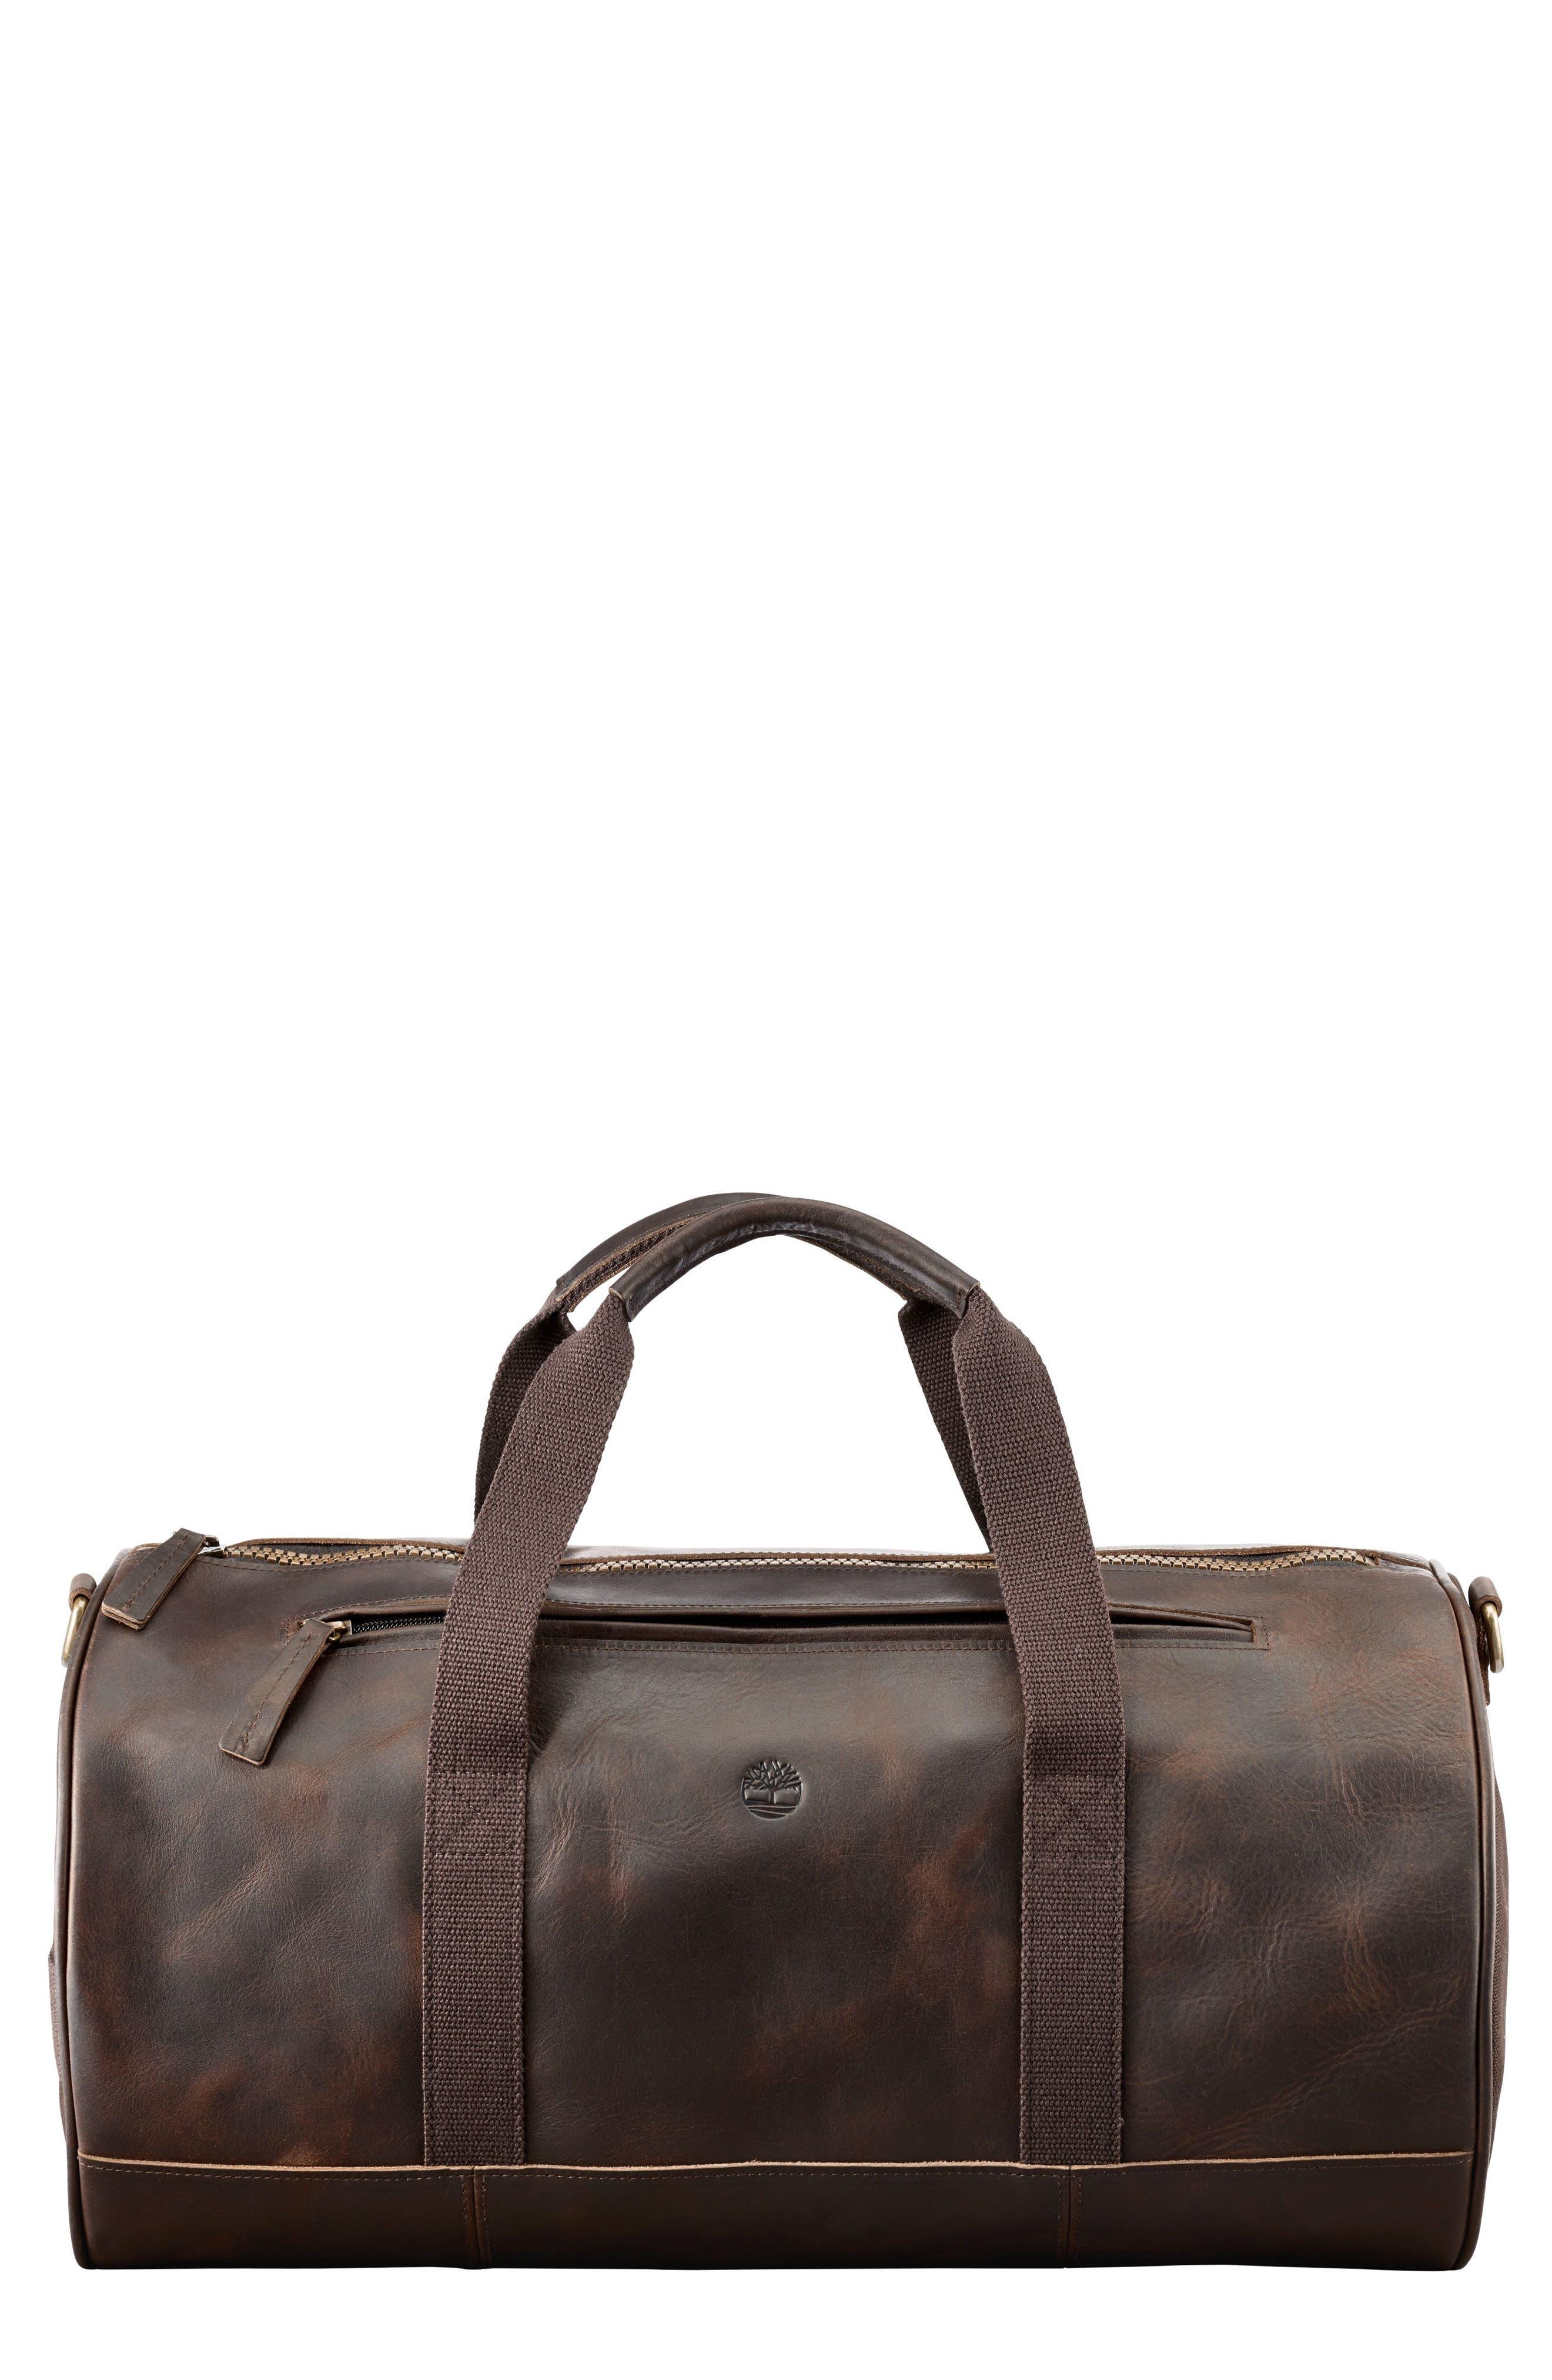 Alternate Image 1 Selected - Timberland Tuckerman Leather Duffel